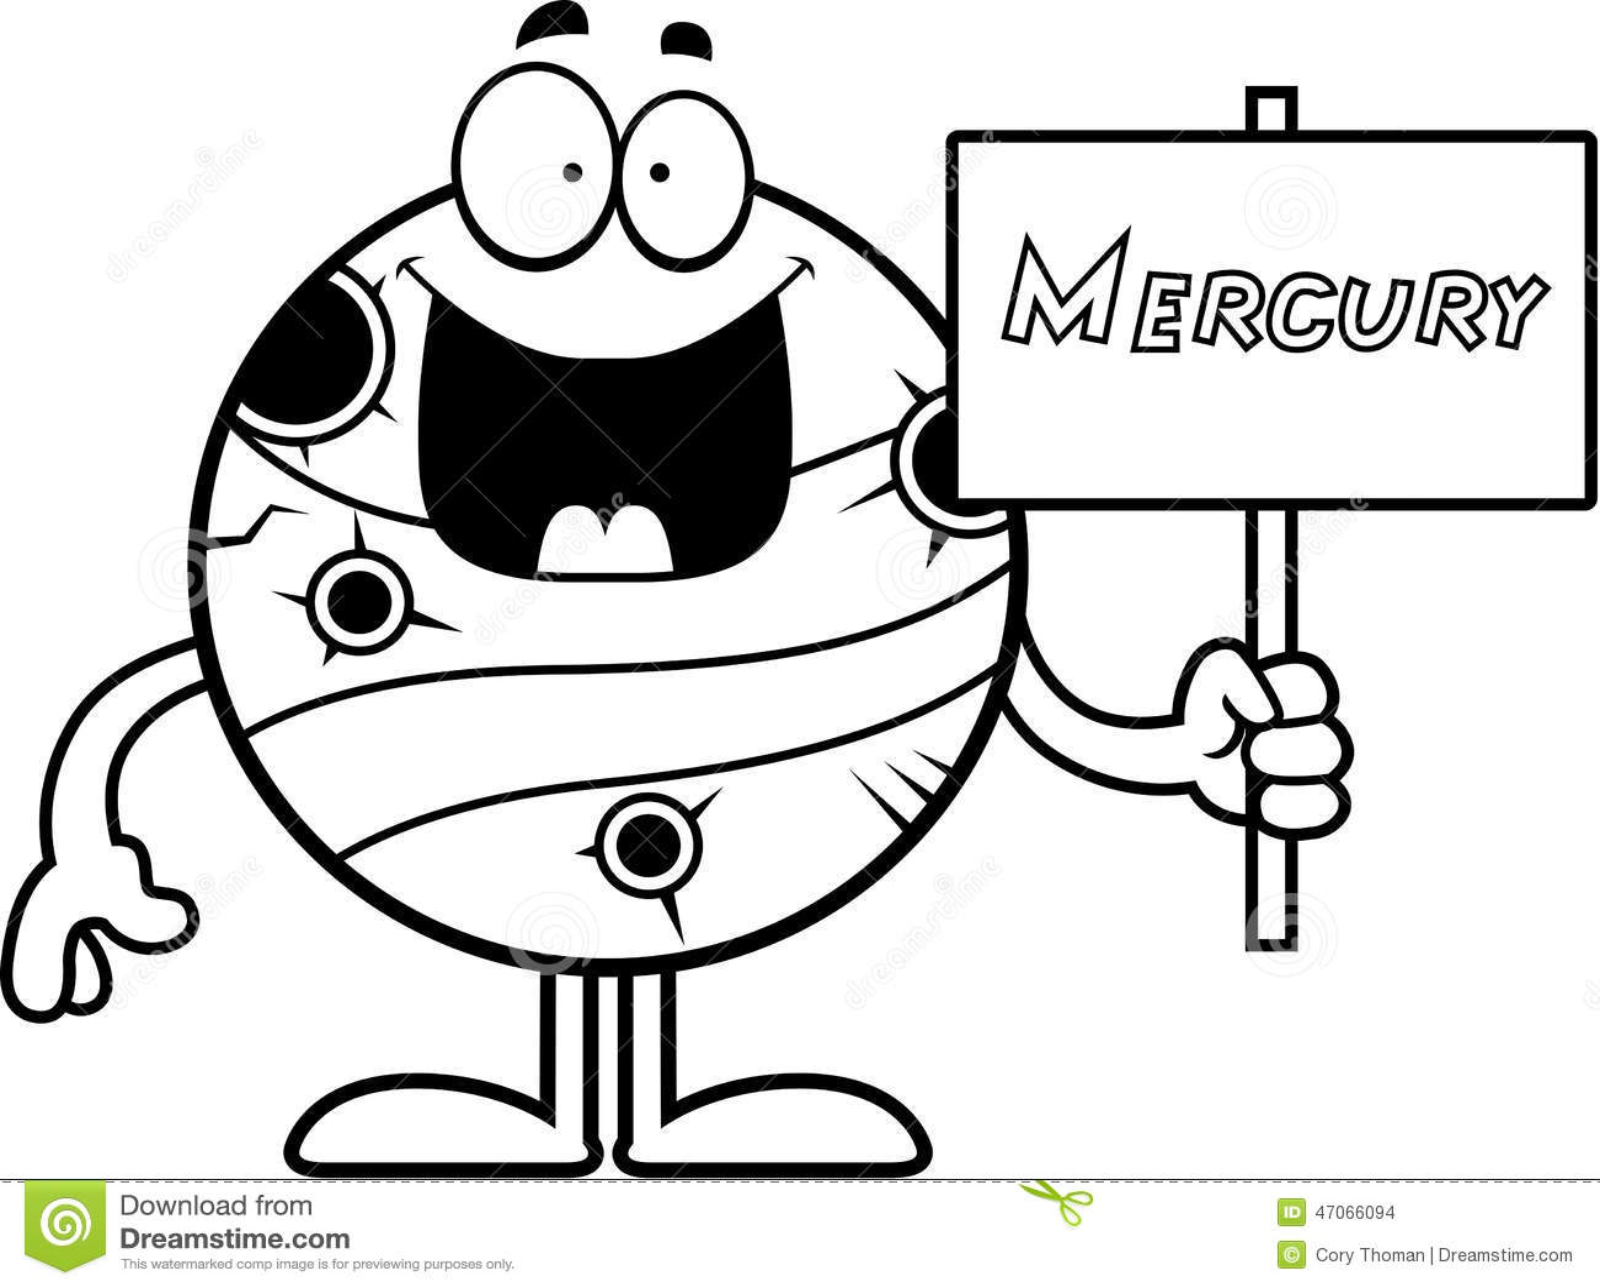 Cartoon Mercury Sign Stock Vector